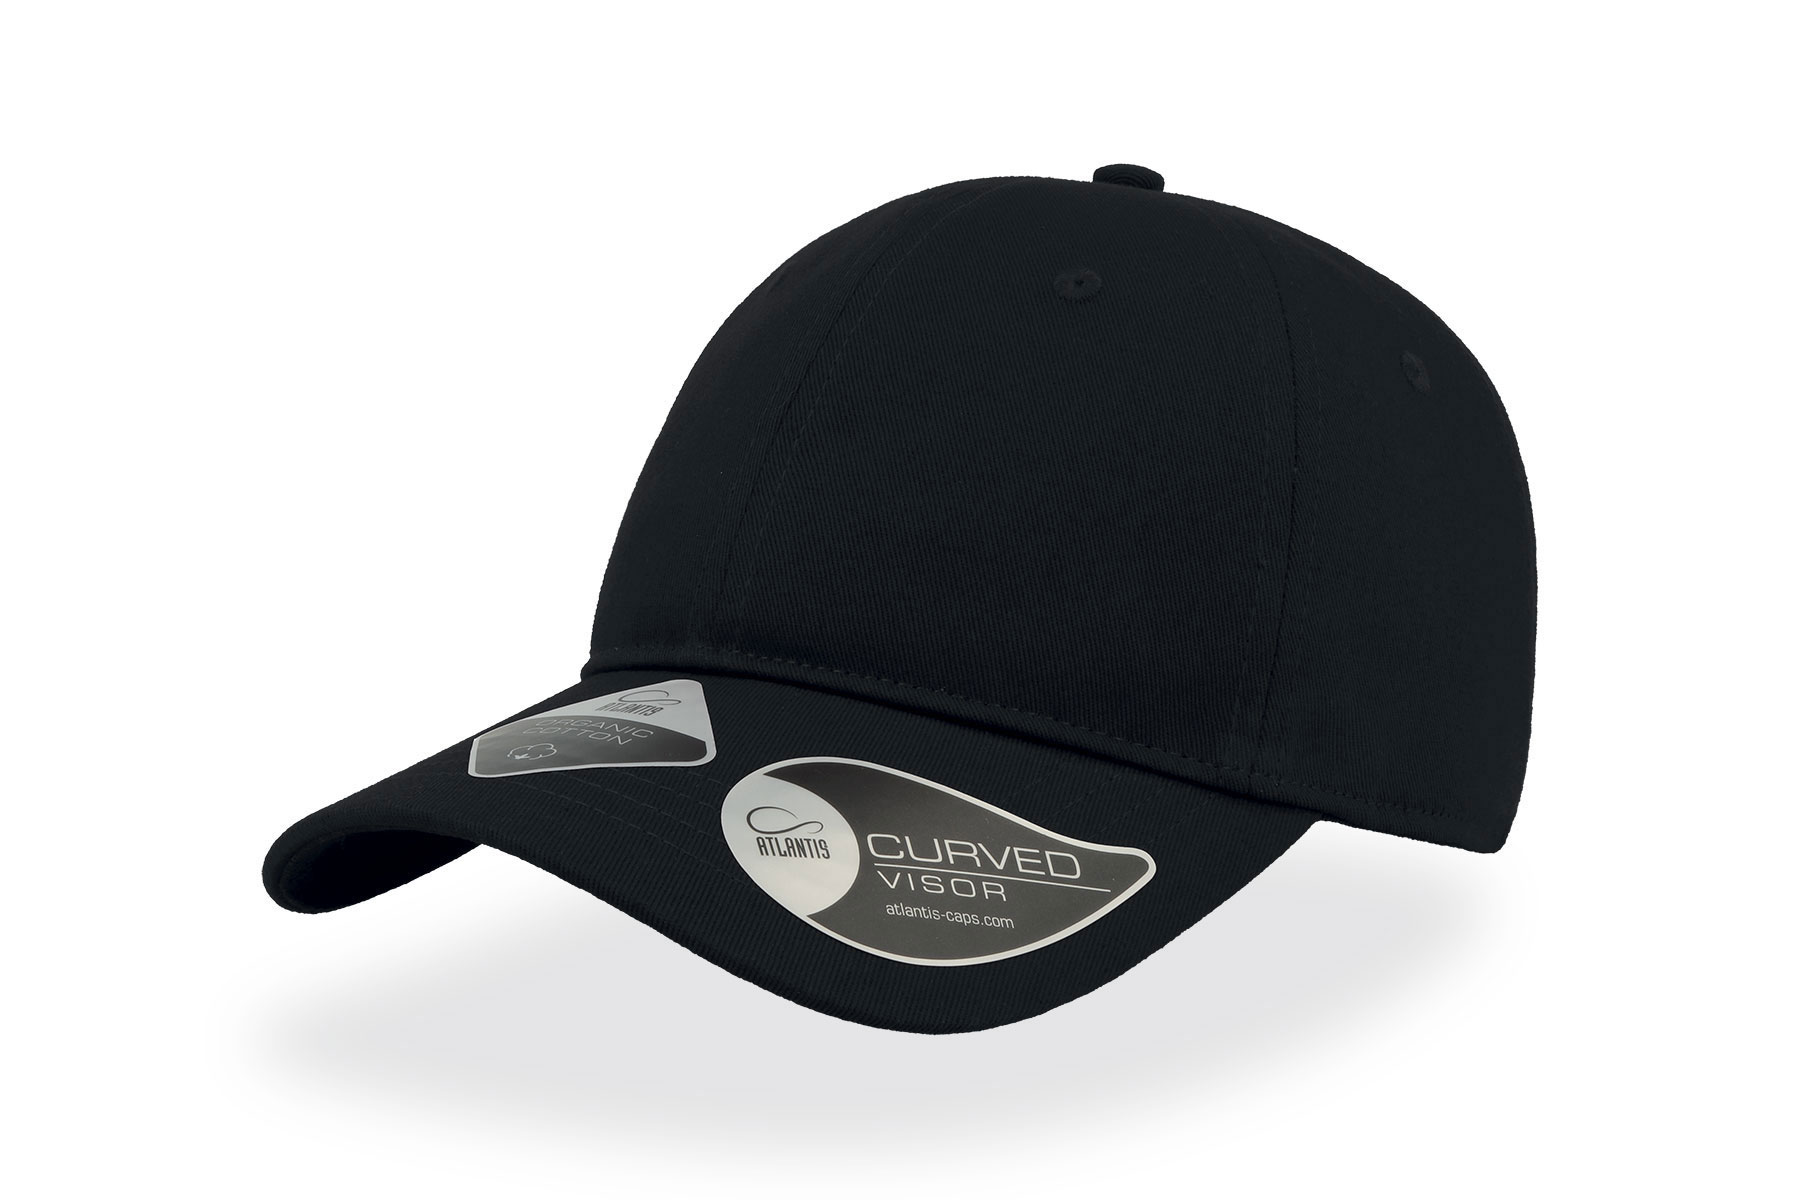 Green Cap lippis - NEW 2019 ATLANTIS CAPS & HATS - GRCA - 2